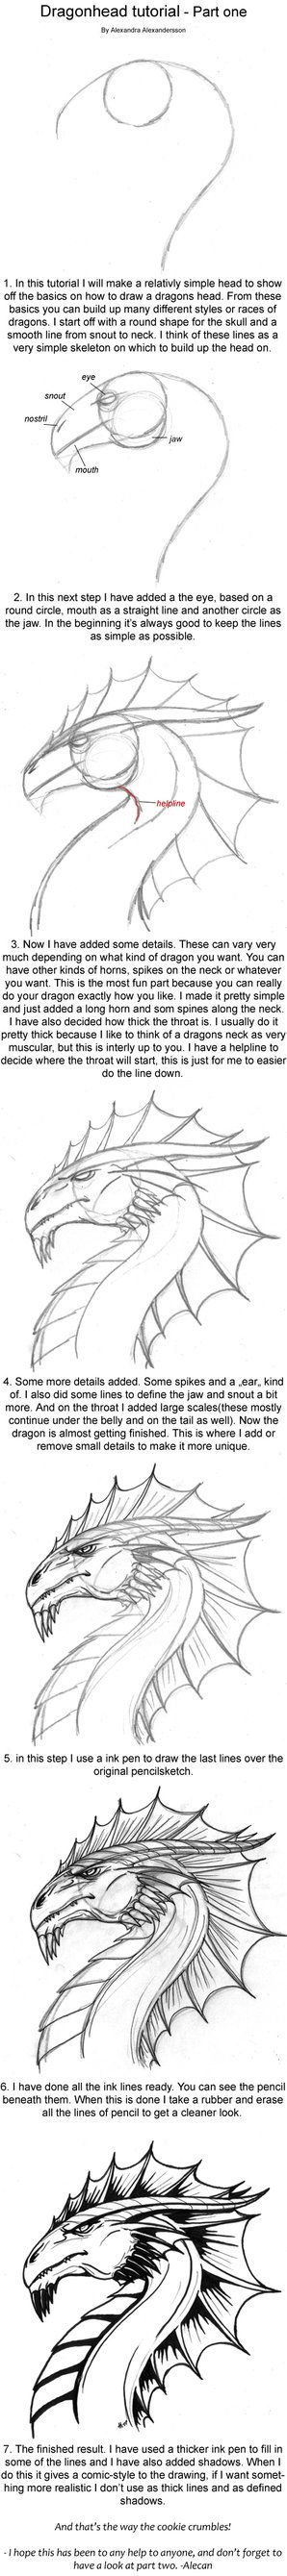 Dragonhead Tutorial part one by alecan on DeviantArt